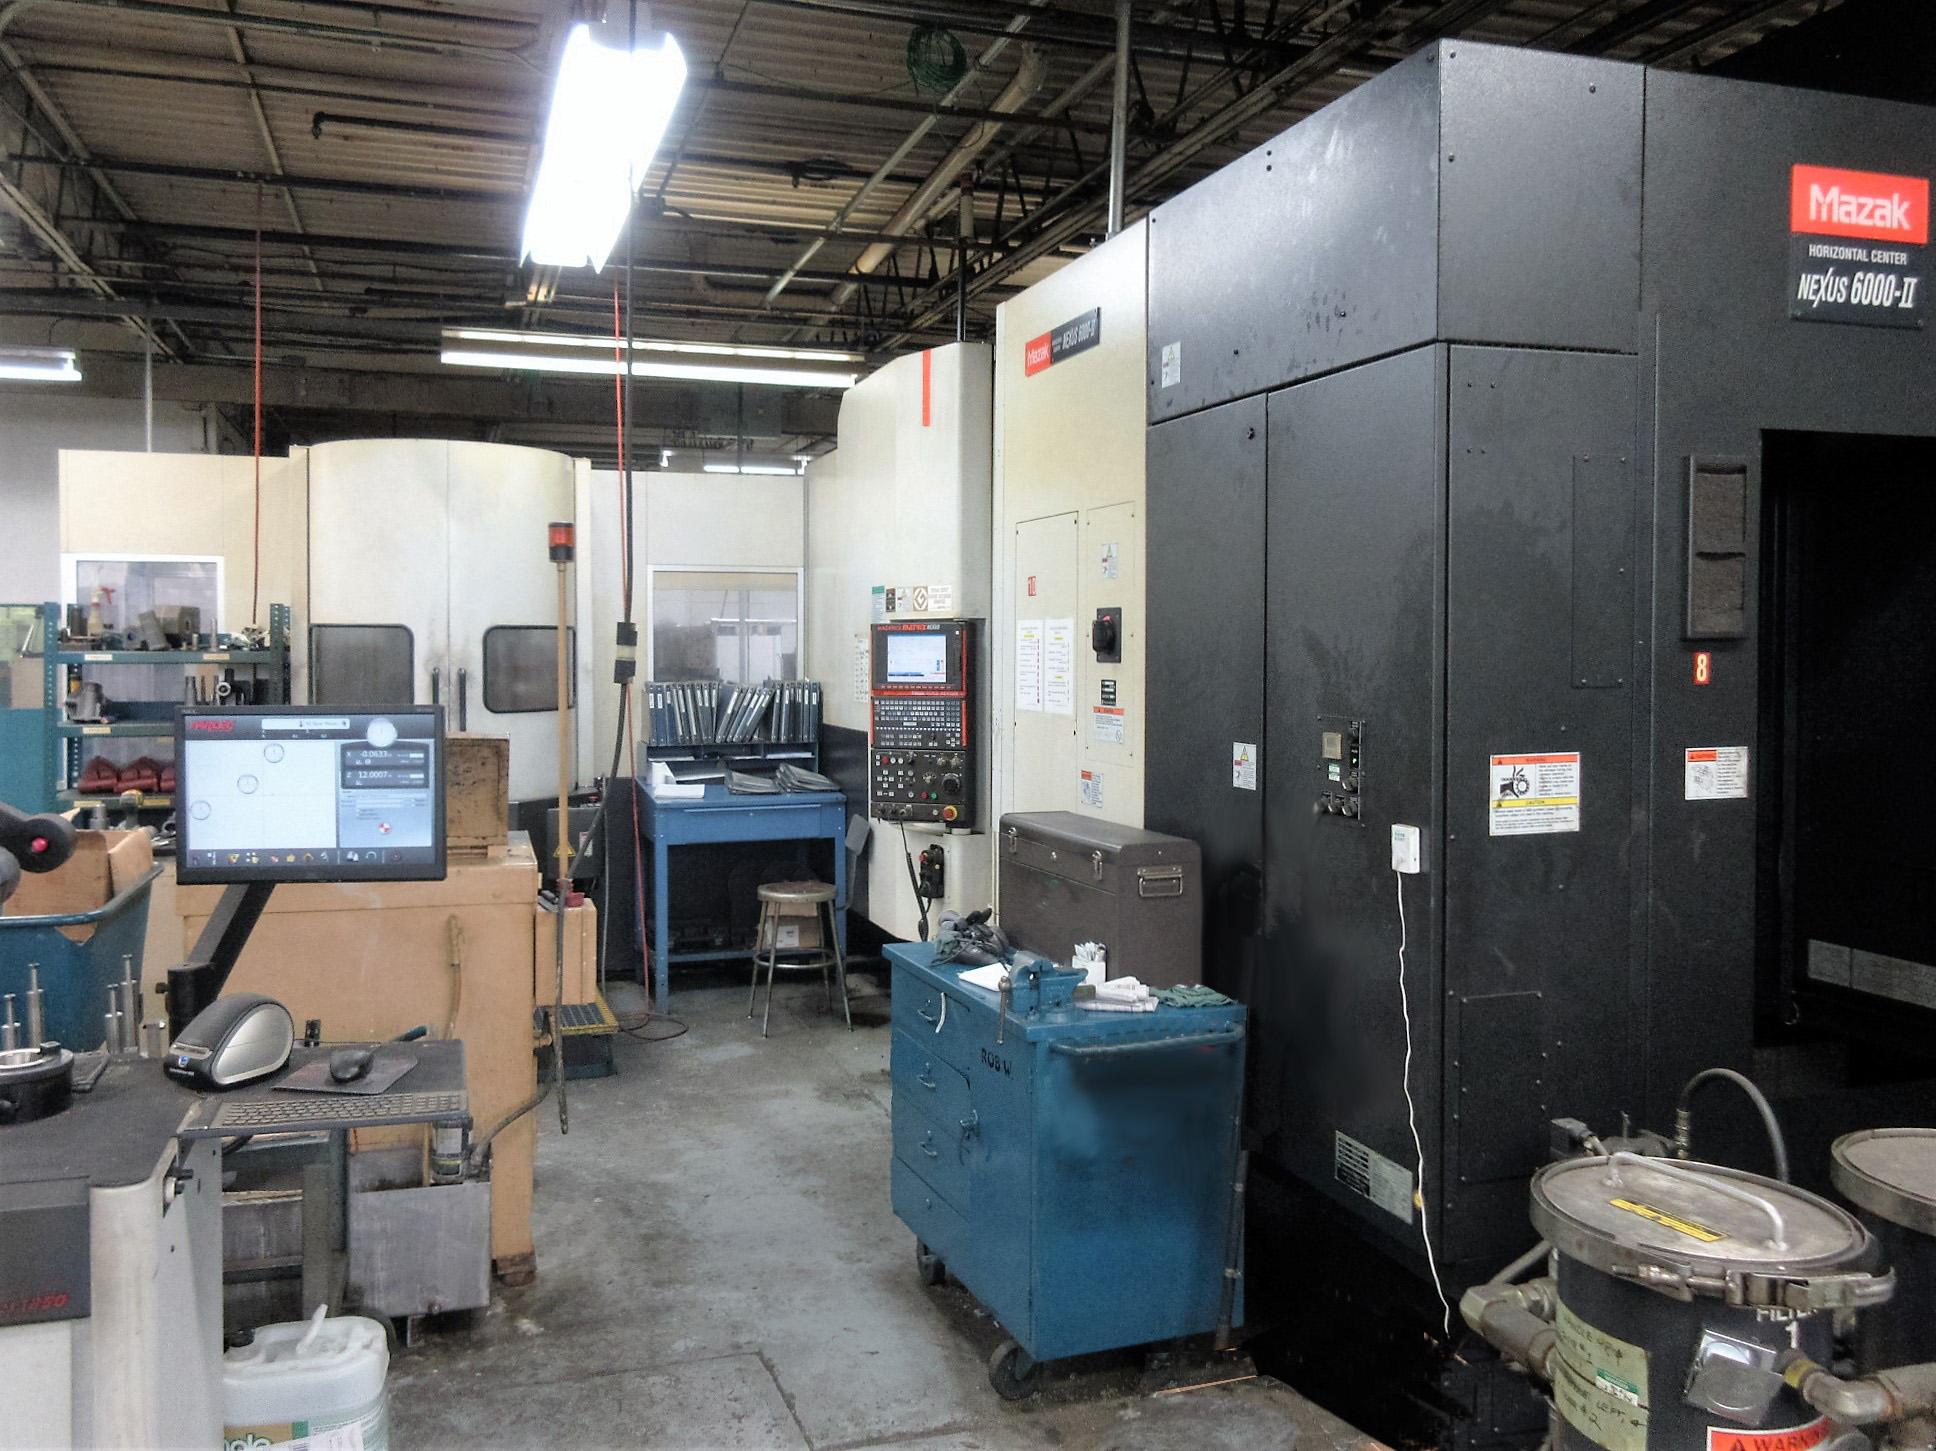 Mazak HCN-6000-II CNC Horizontal Machining Center With Palletech System - Image 18 of 22